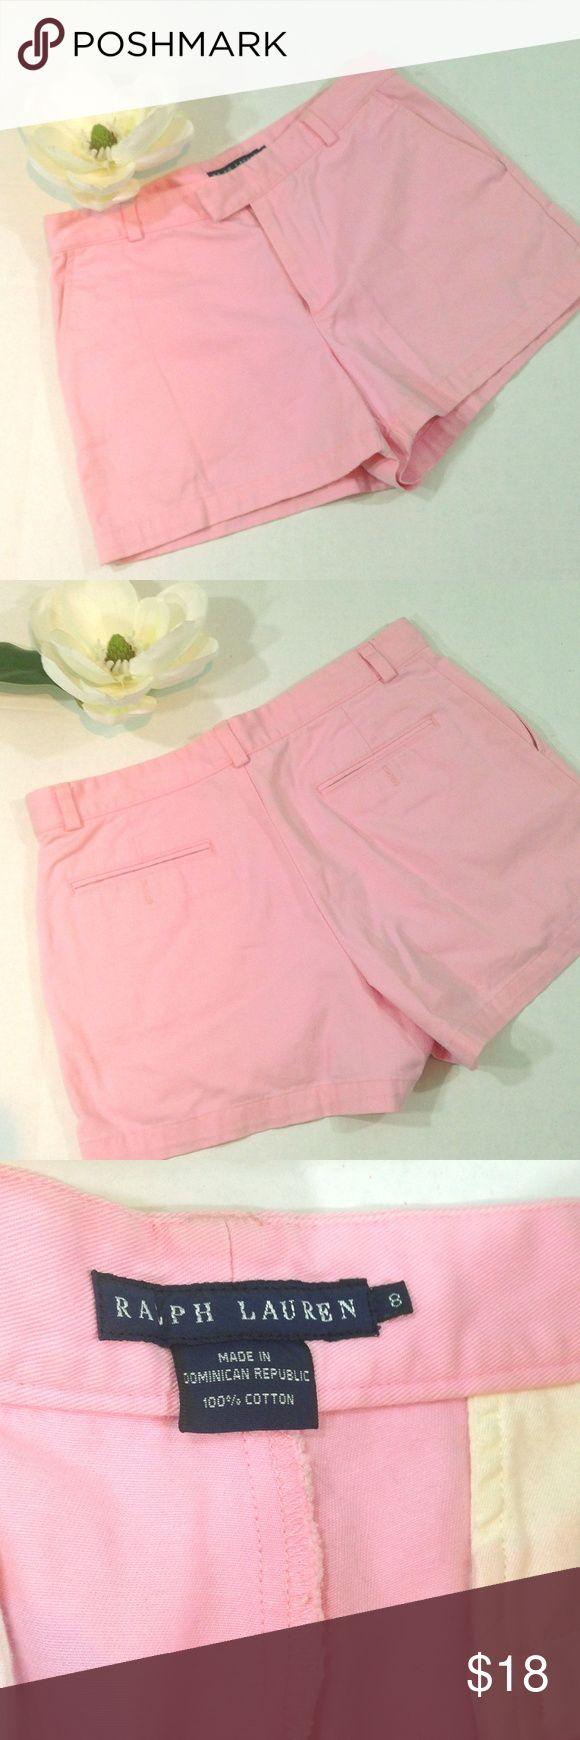 "Ralph Lauren Chino Pink Shorts Very cute Ralph Lauren pink chino shorts, side pocket, hook and button tab closure, flat lay measures a 16"" waist, 3"" inseam and a 13"" length. Ralph Lauren Shorts"